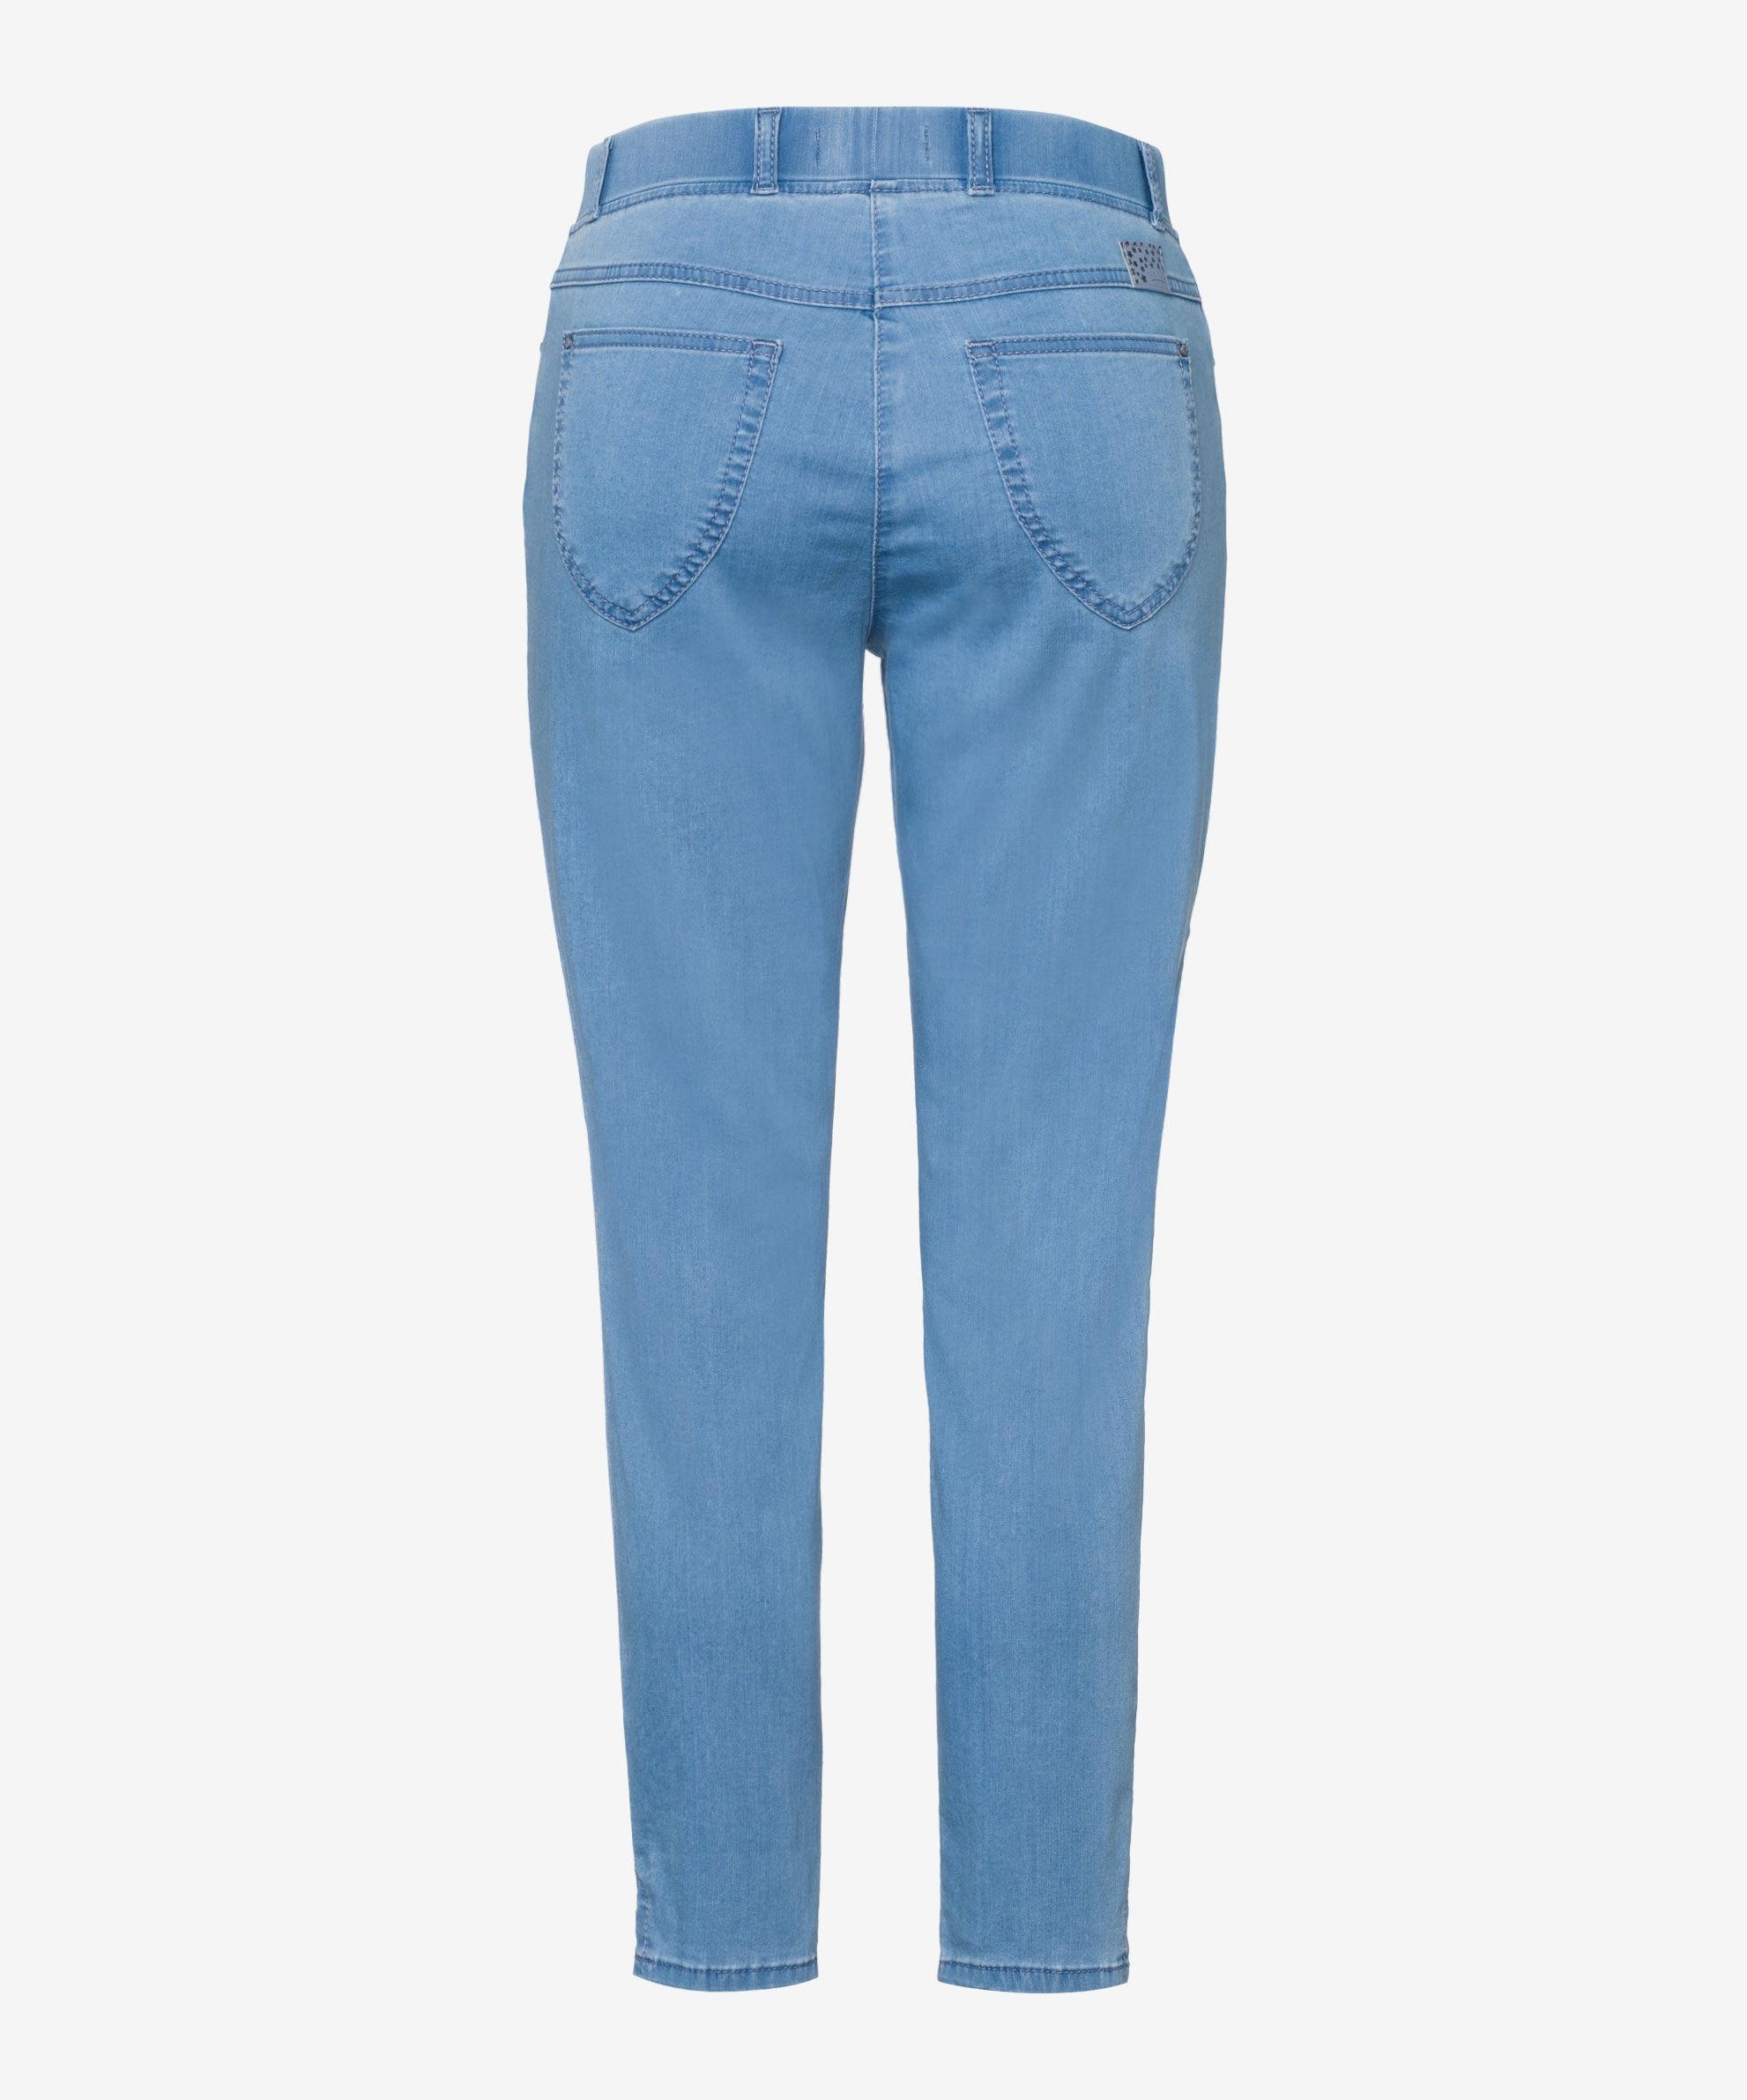 Raphaela Brax Jeans Lavina blau